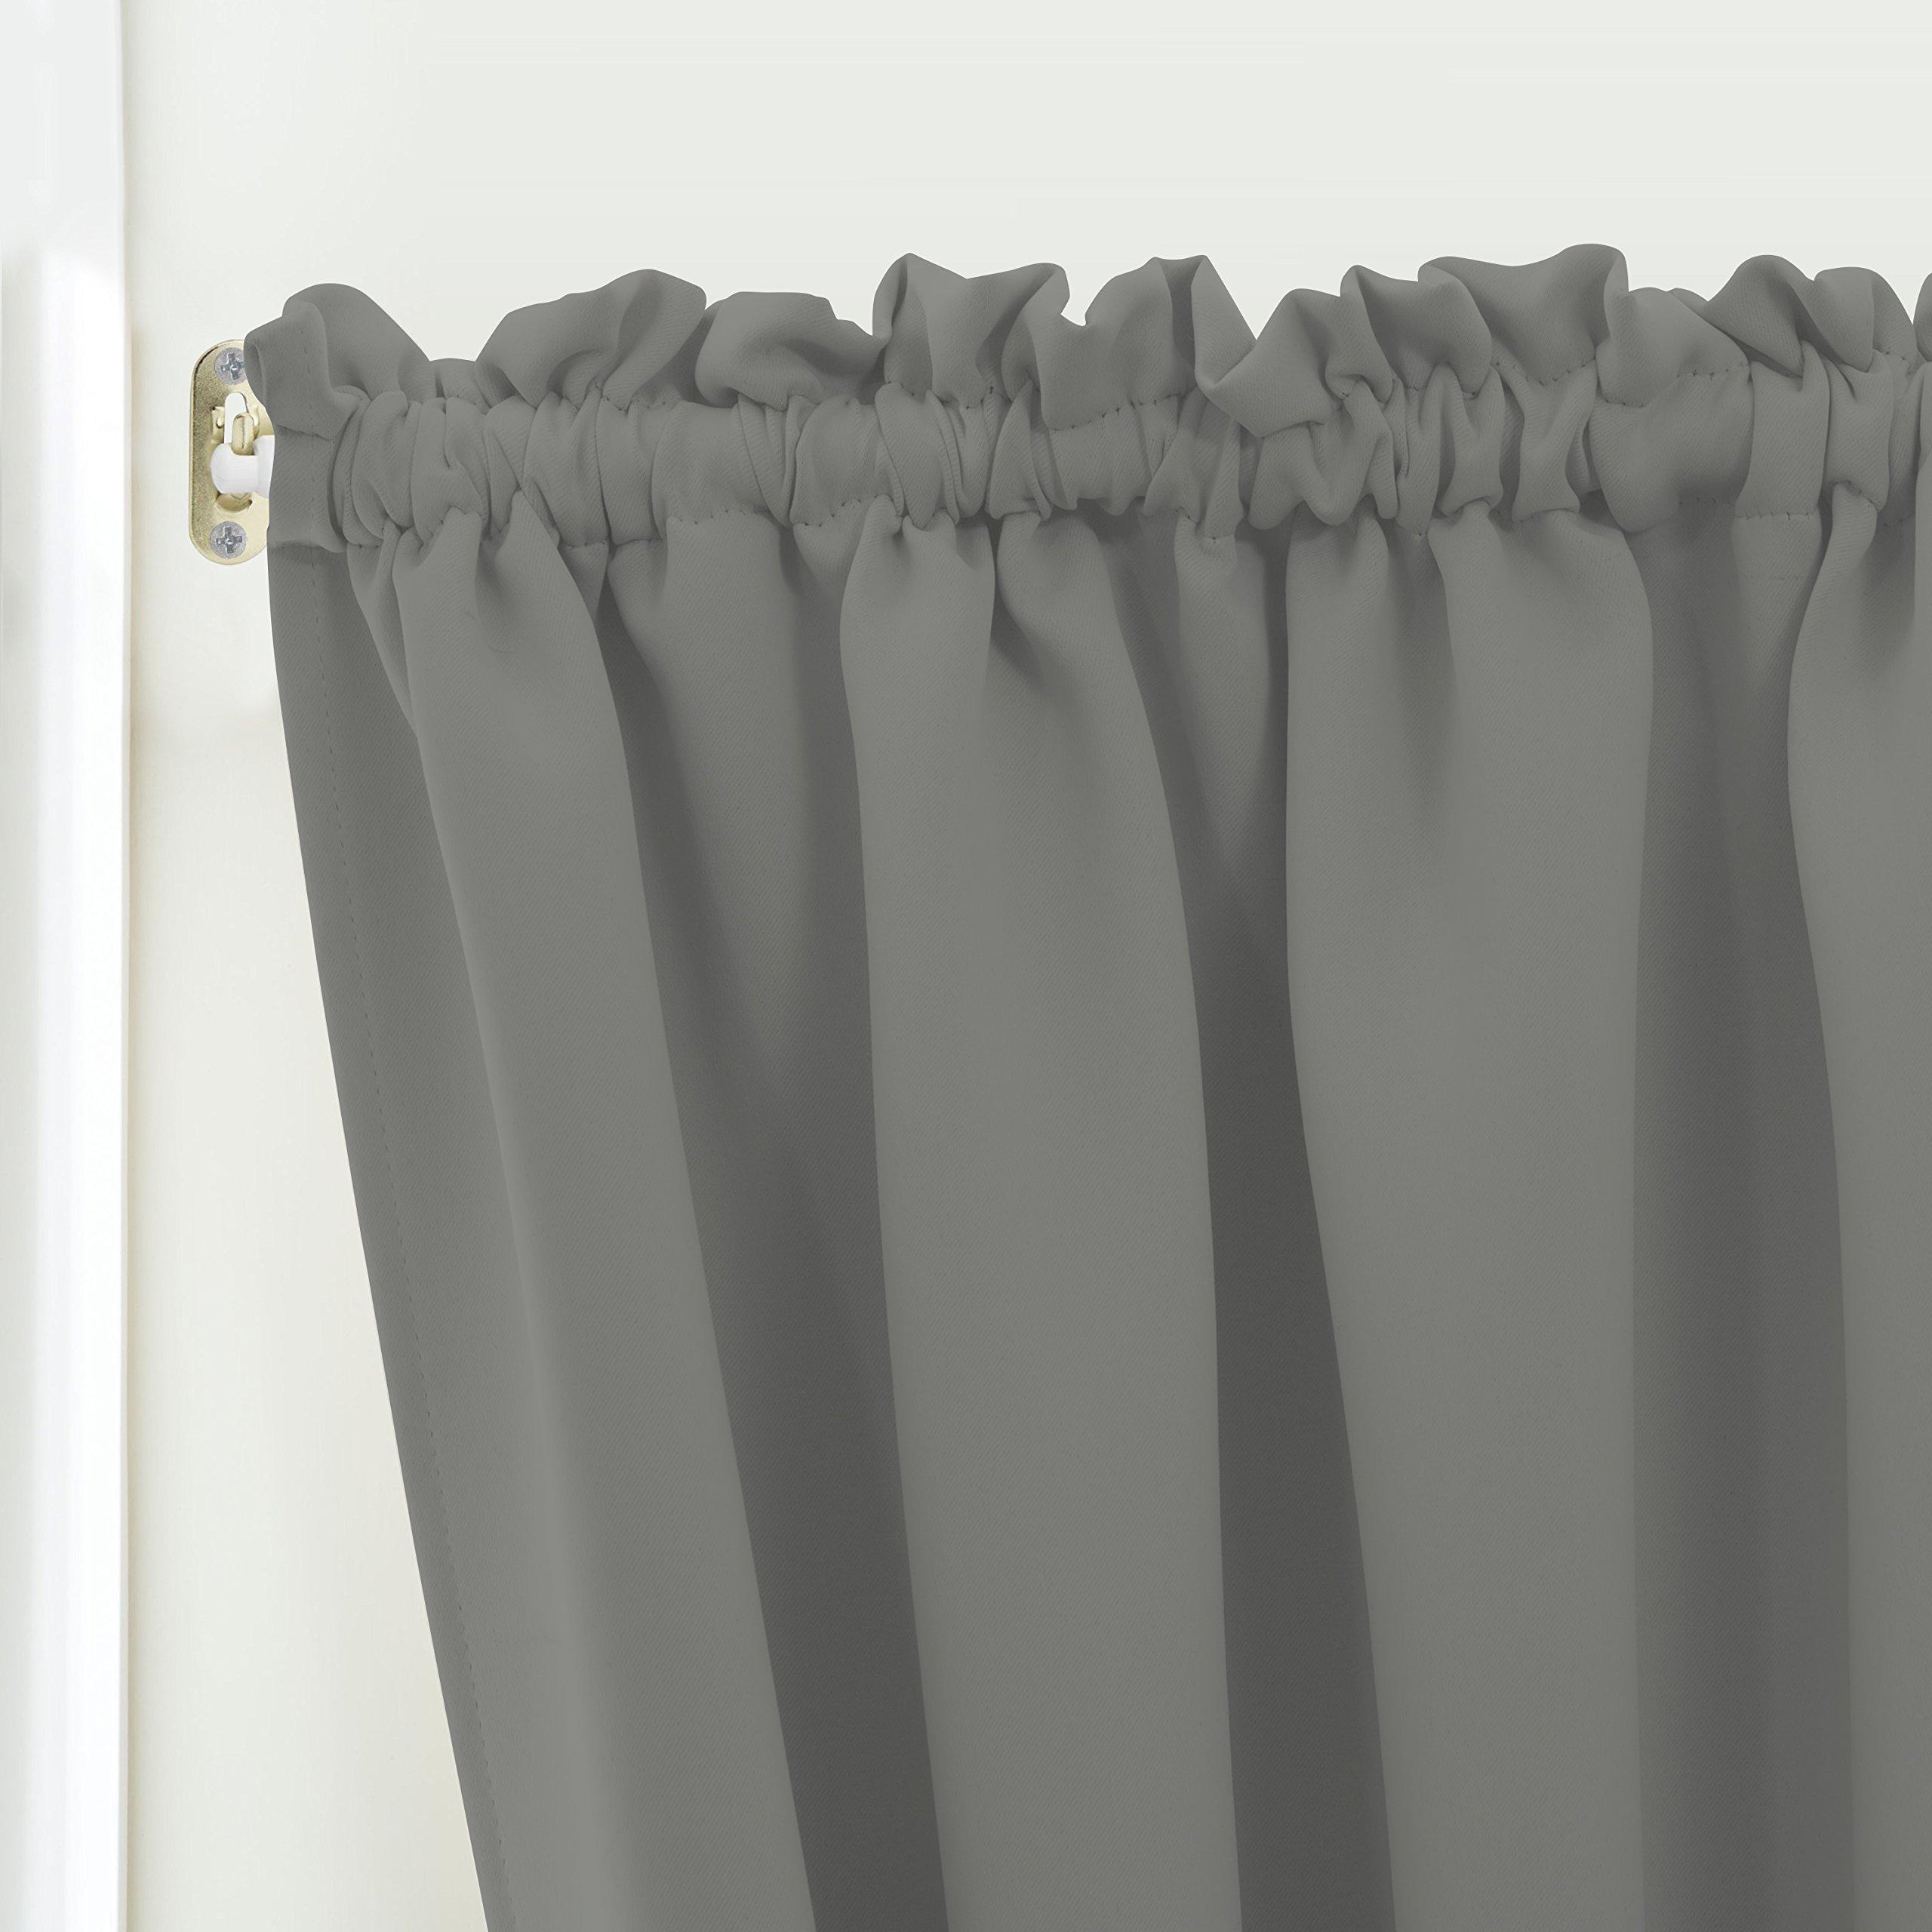 Blackout Door/ Window Curtain Panels for Privacy - Aquazolax 54W x 40L Blackout Window Treatment Curtains for French Door - 1 Panel, Grey by Aquazolax (Image #6)